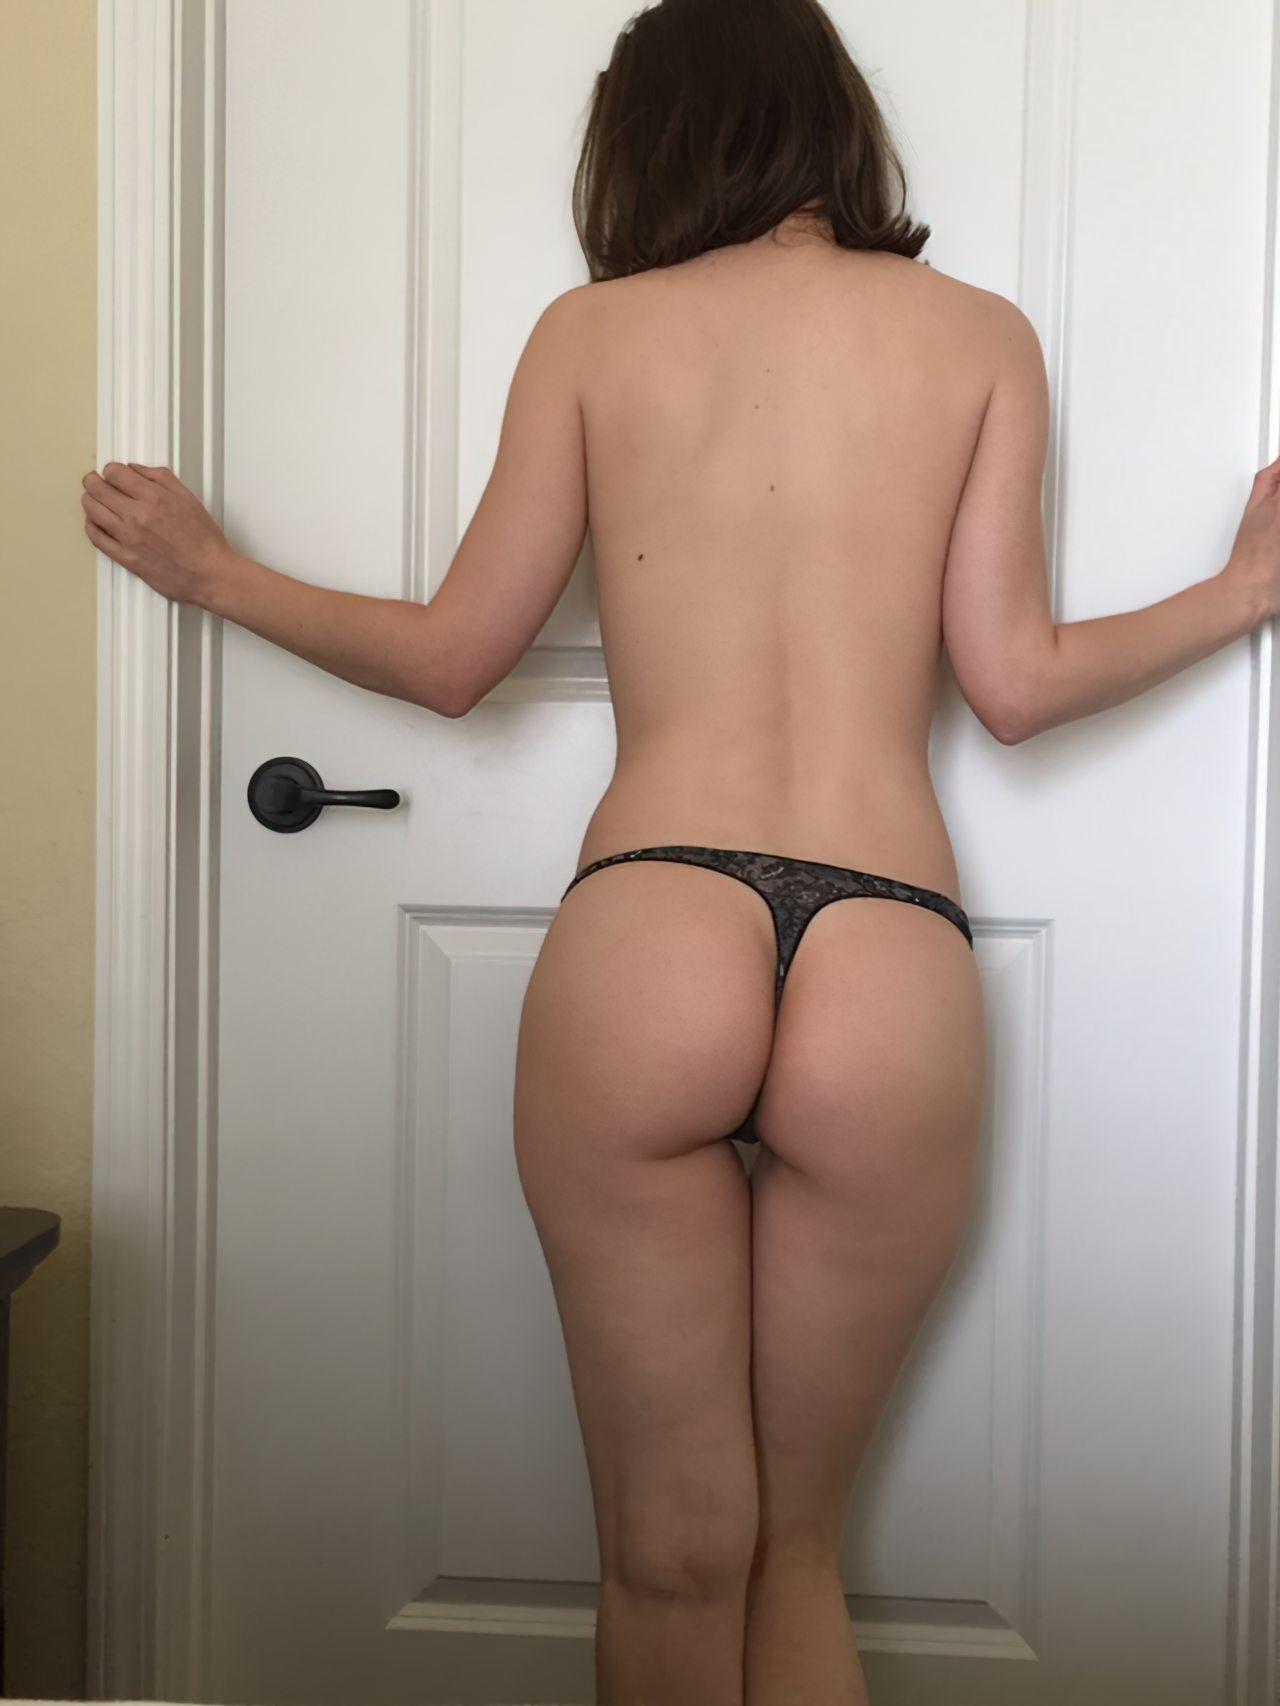 Amadora Se Masturbando no Quarto (1)